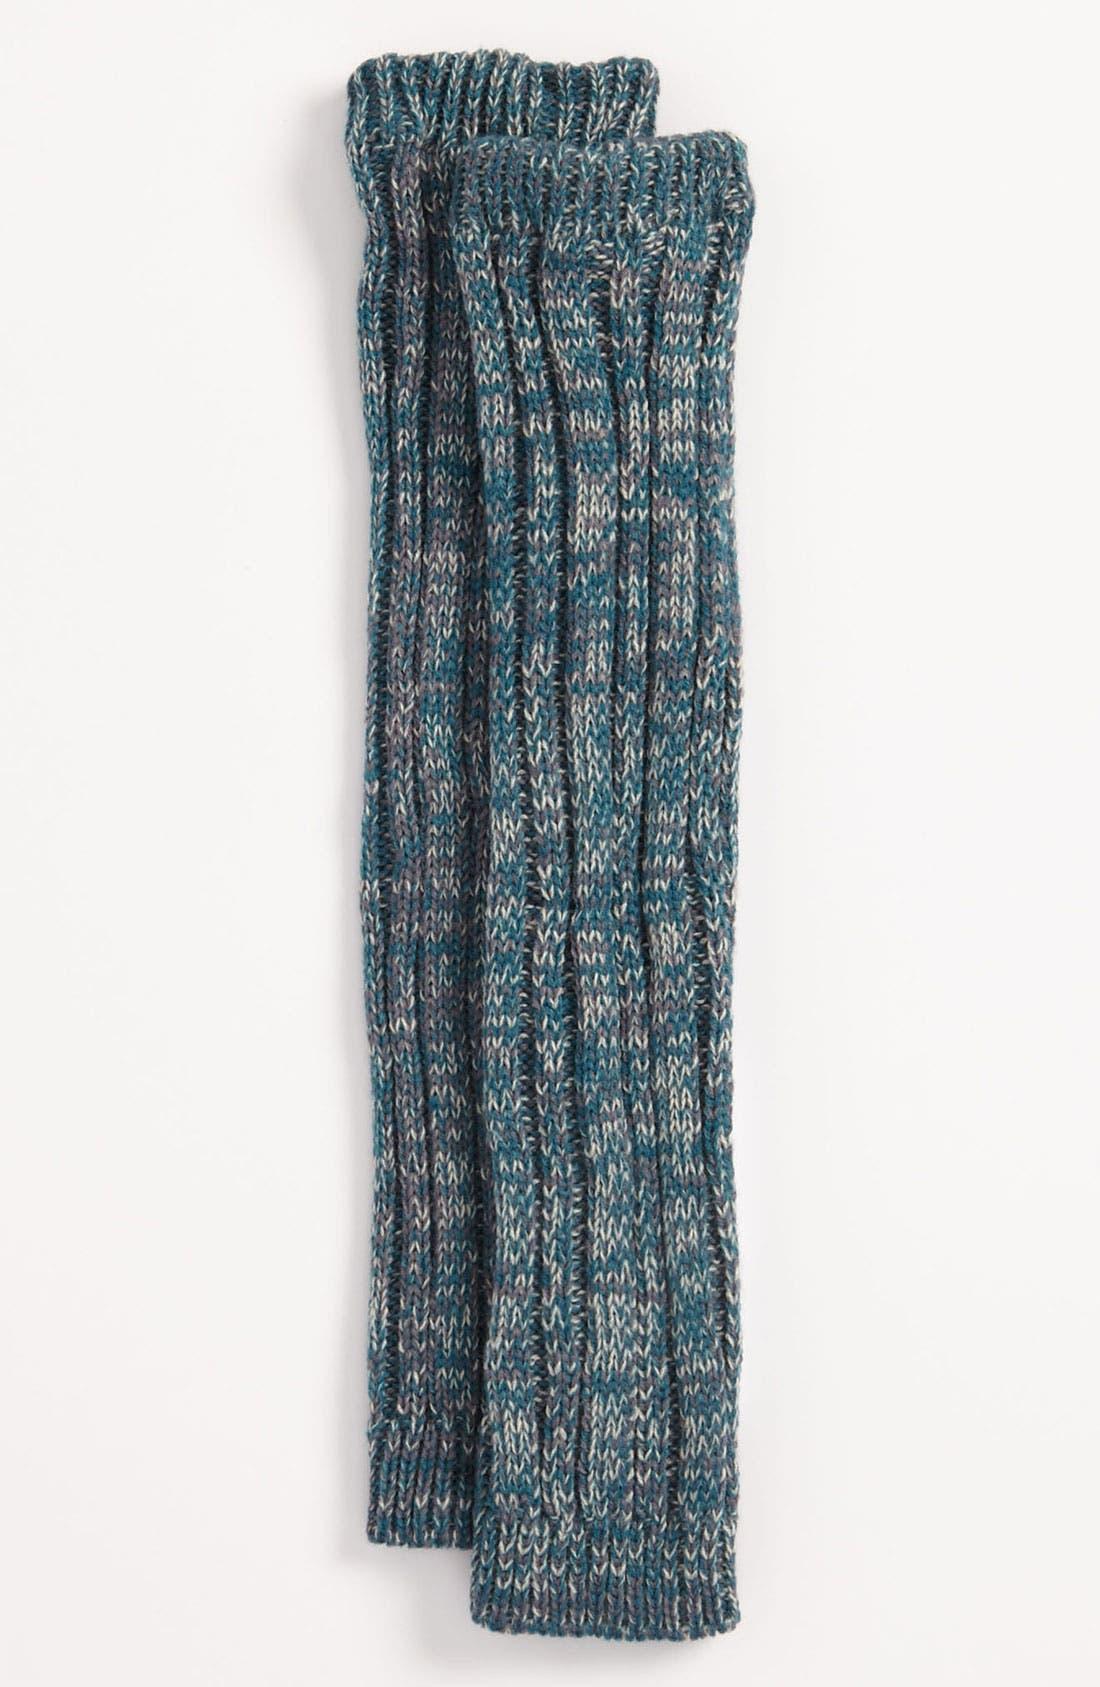 Alternate Image 1 Selected - Nordstrom Twisted Yarn Leg Warmers (Little Girls)